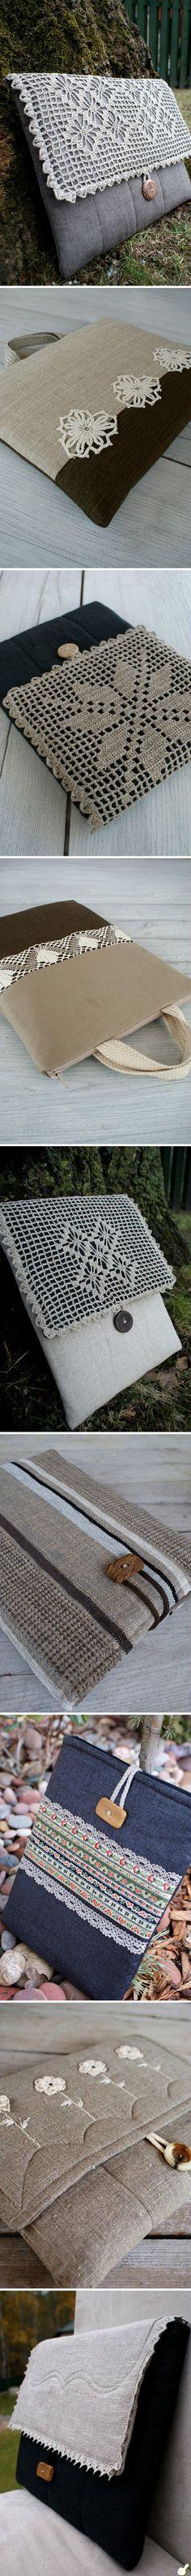 iPad case :: Stylishly decorated with crochet